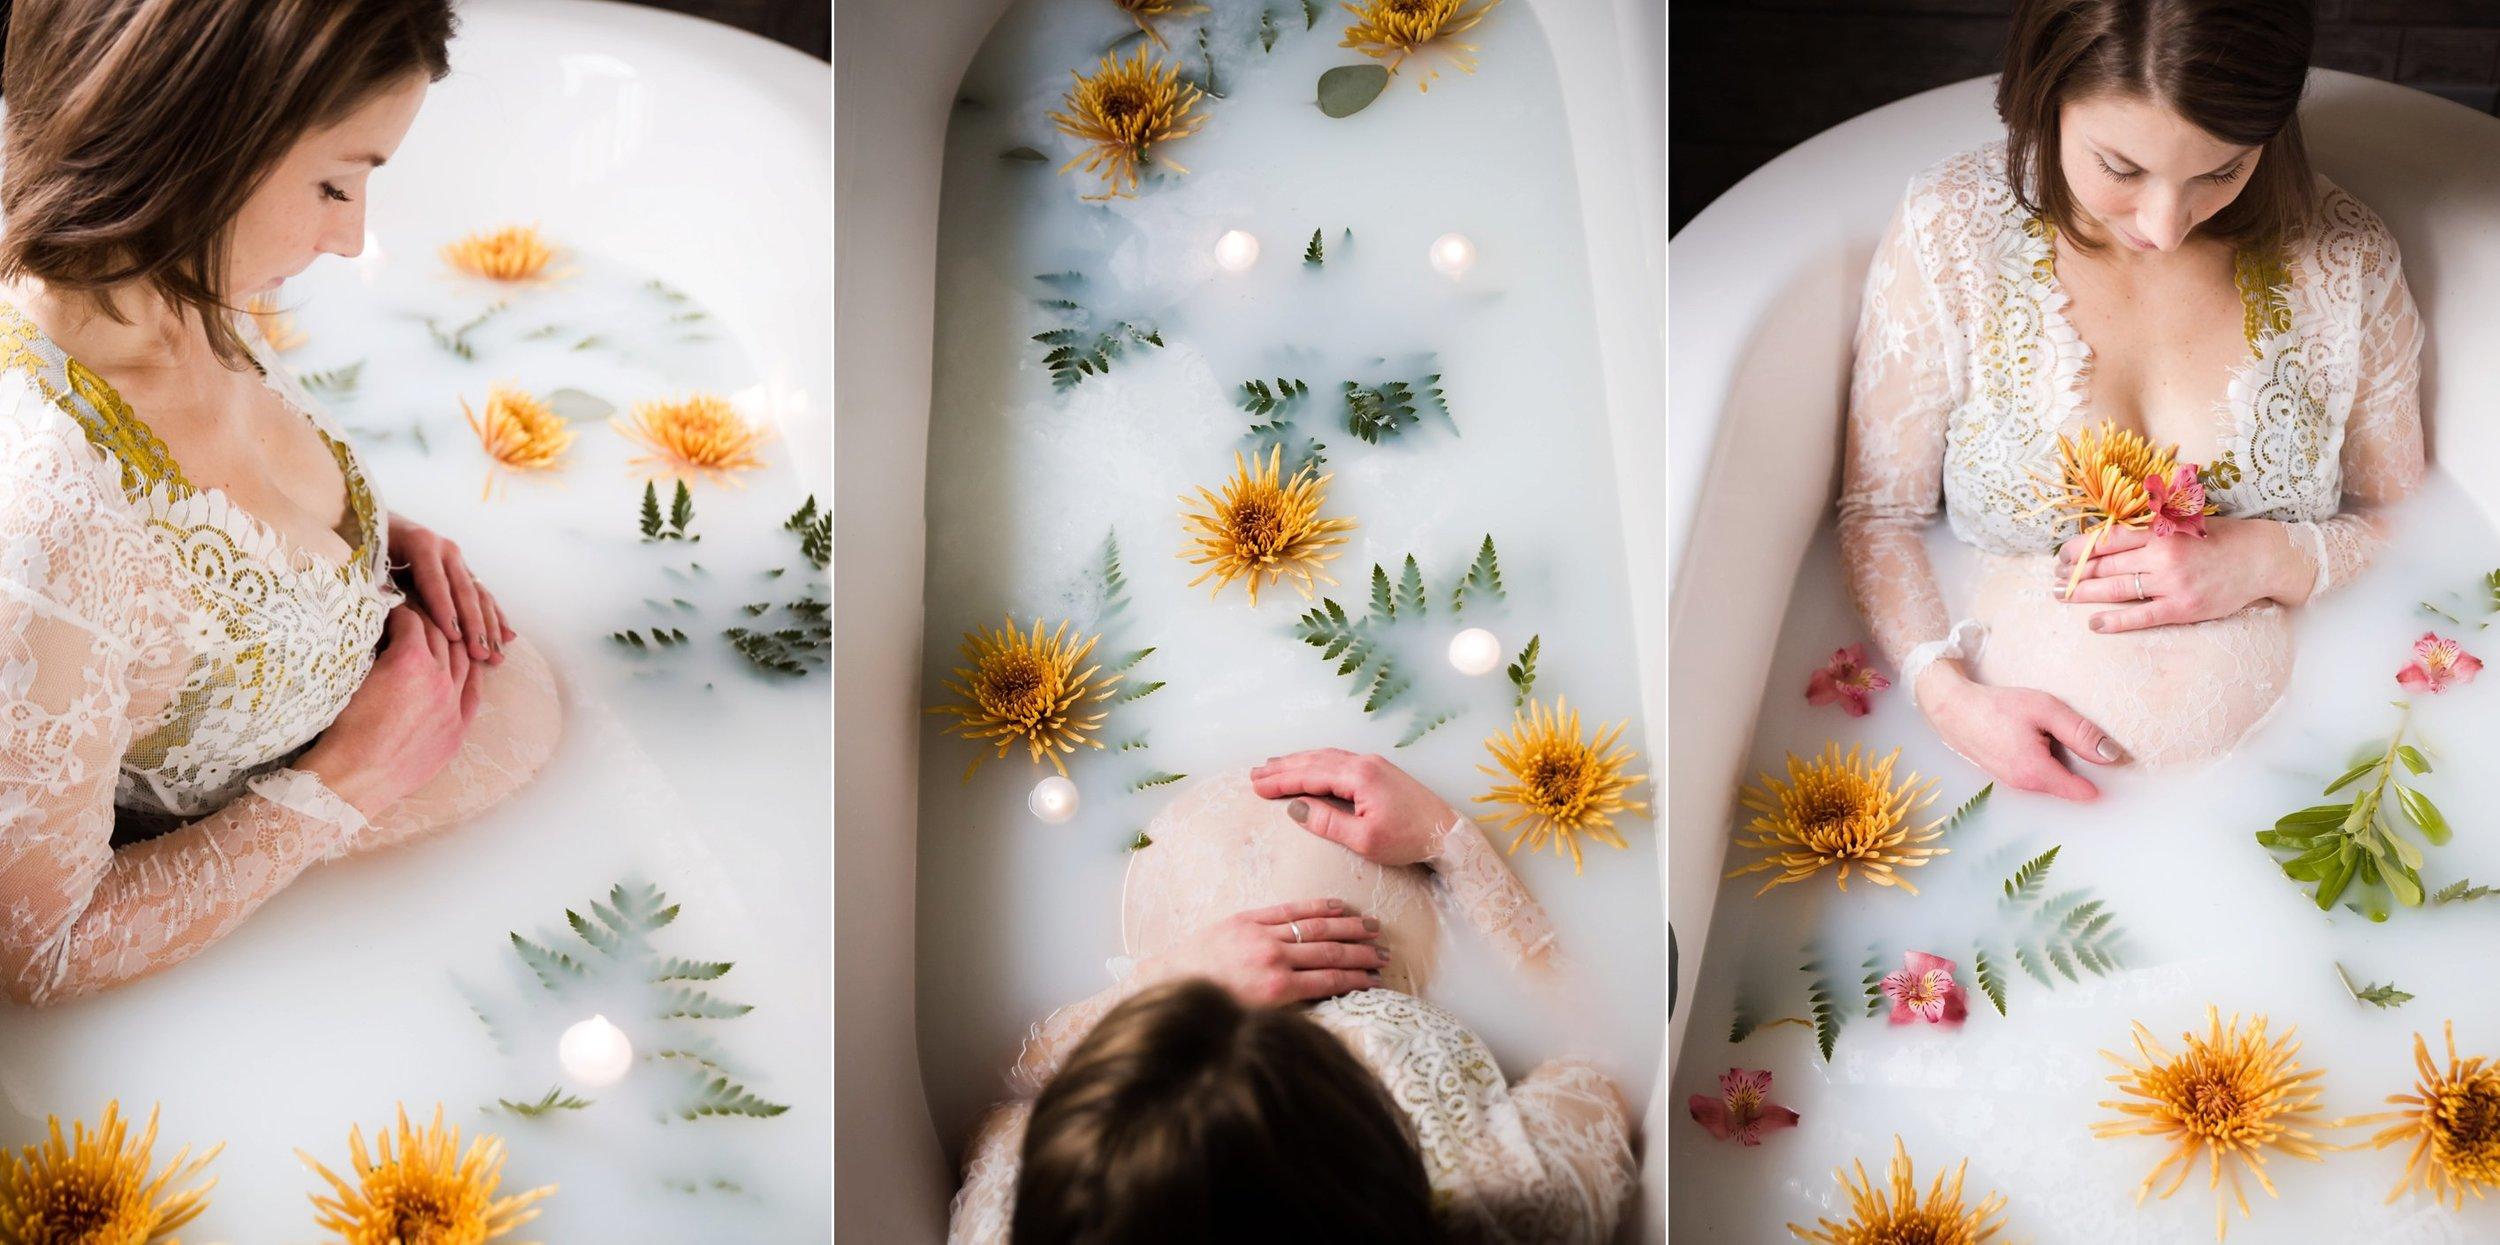 baths_0015.jpg